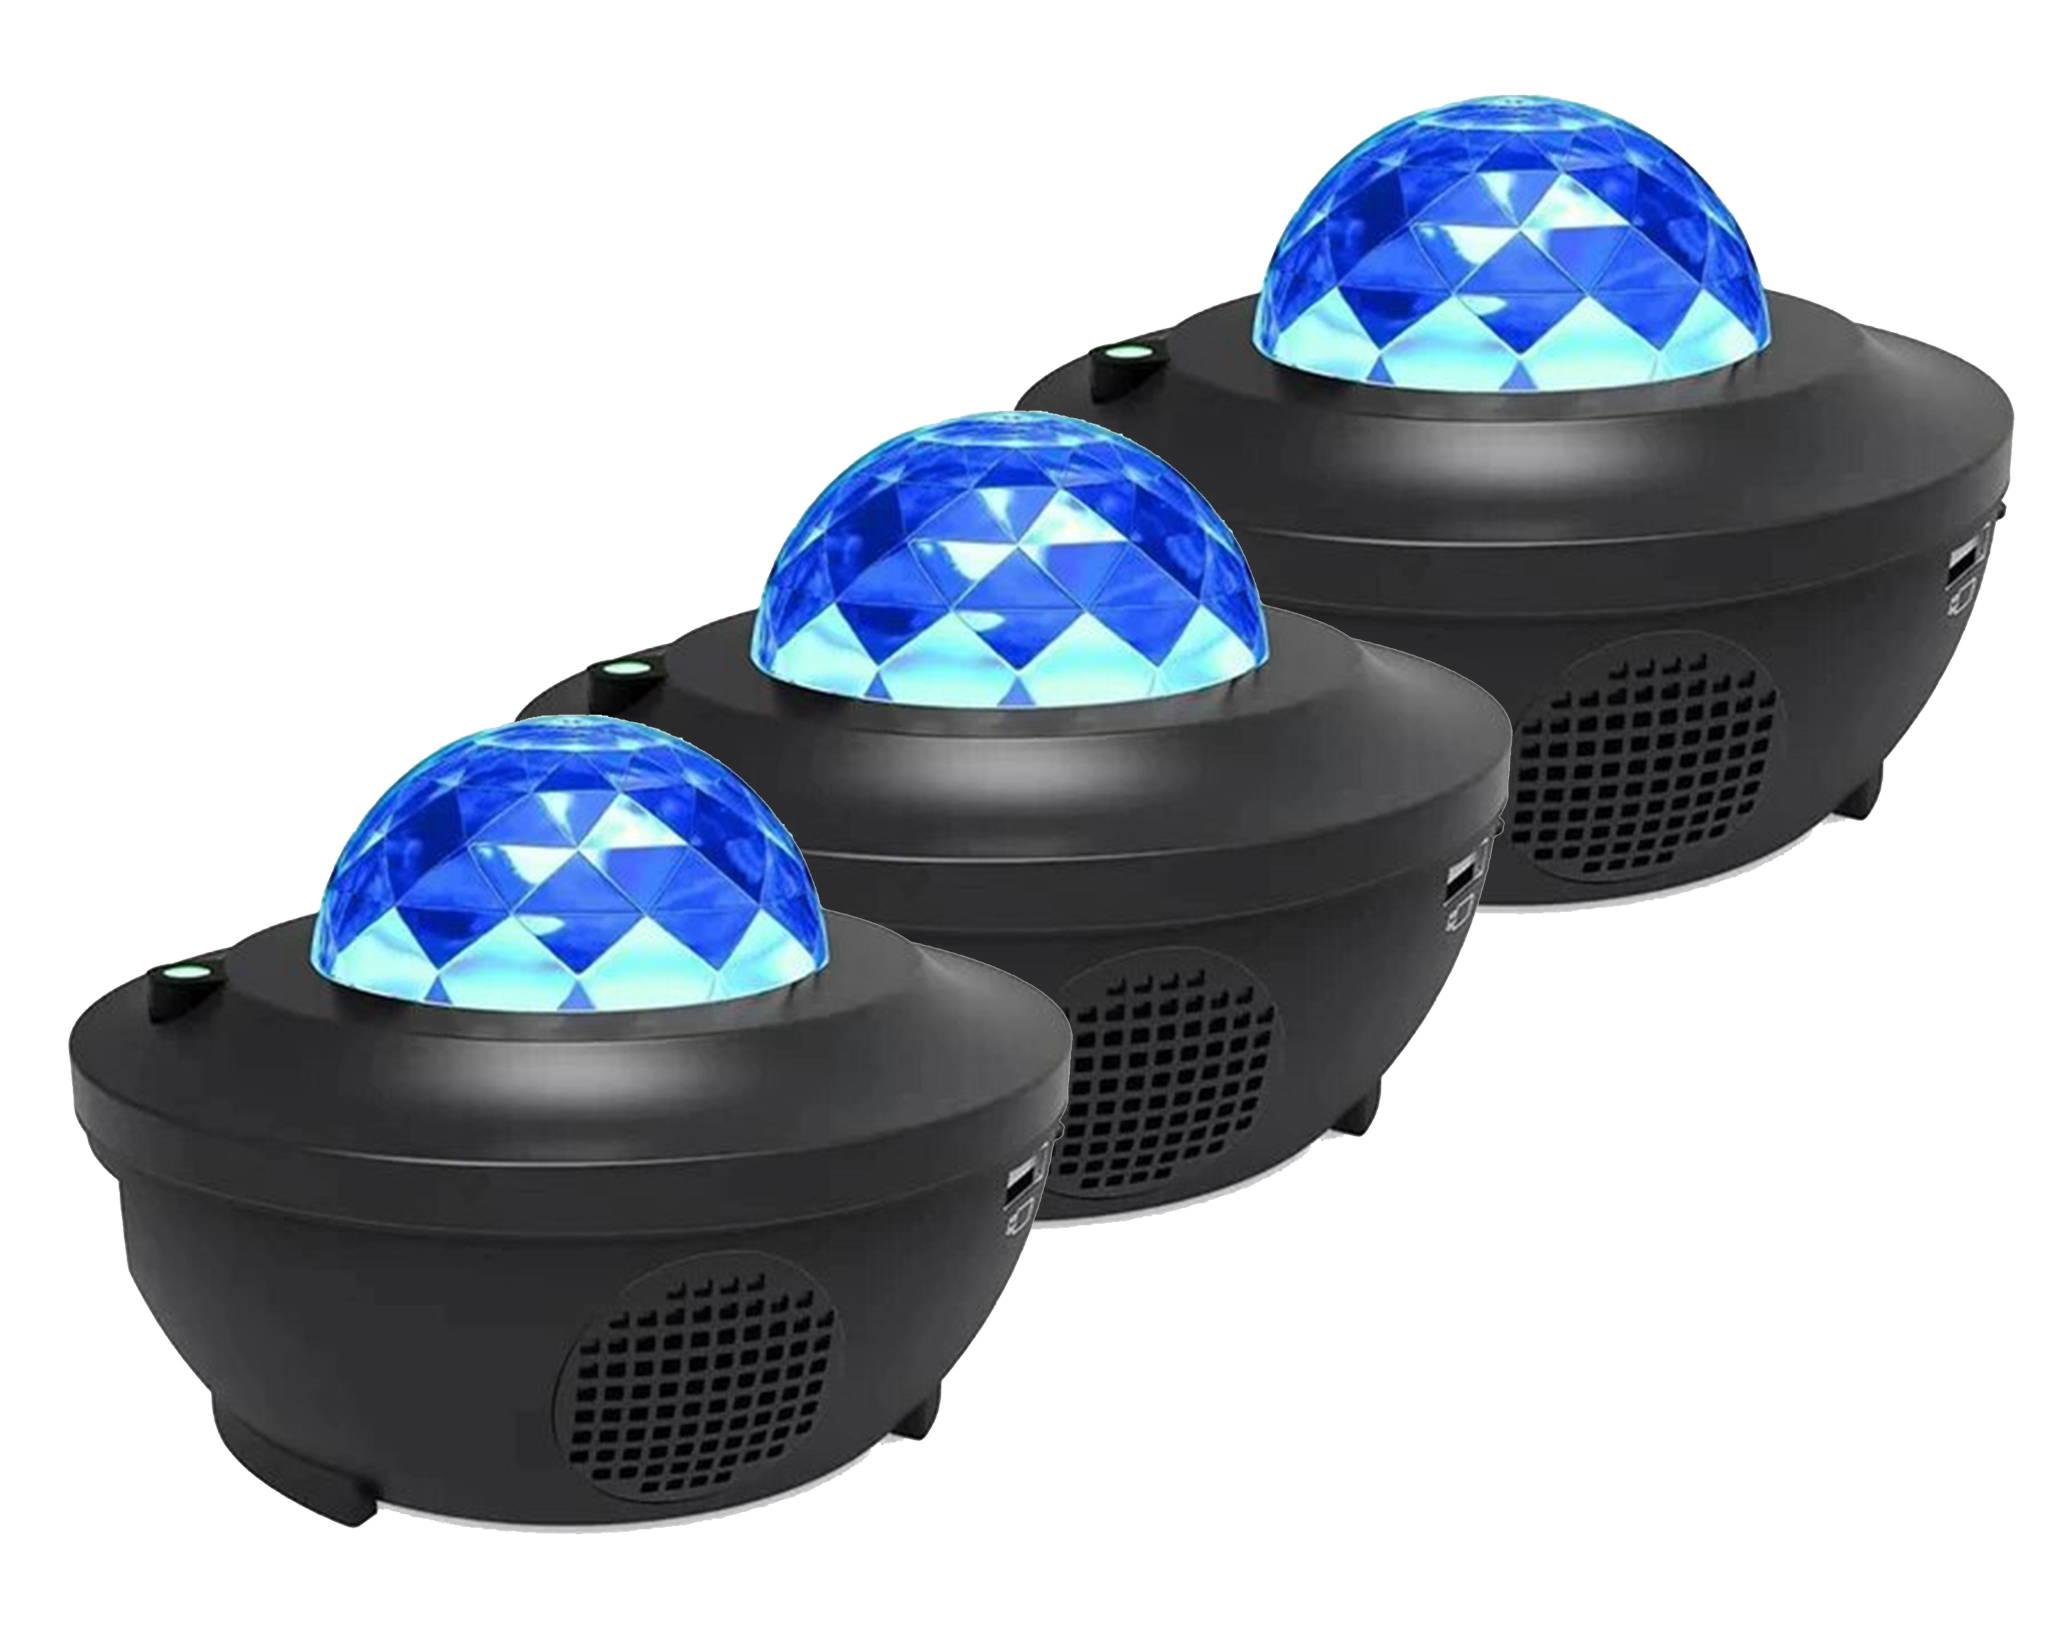 star light projector, ocean light projector, delicacy ocean wave projector